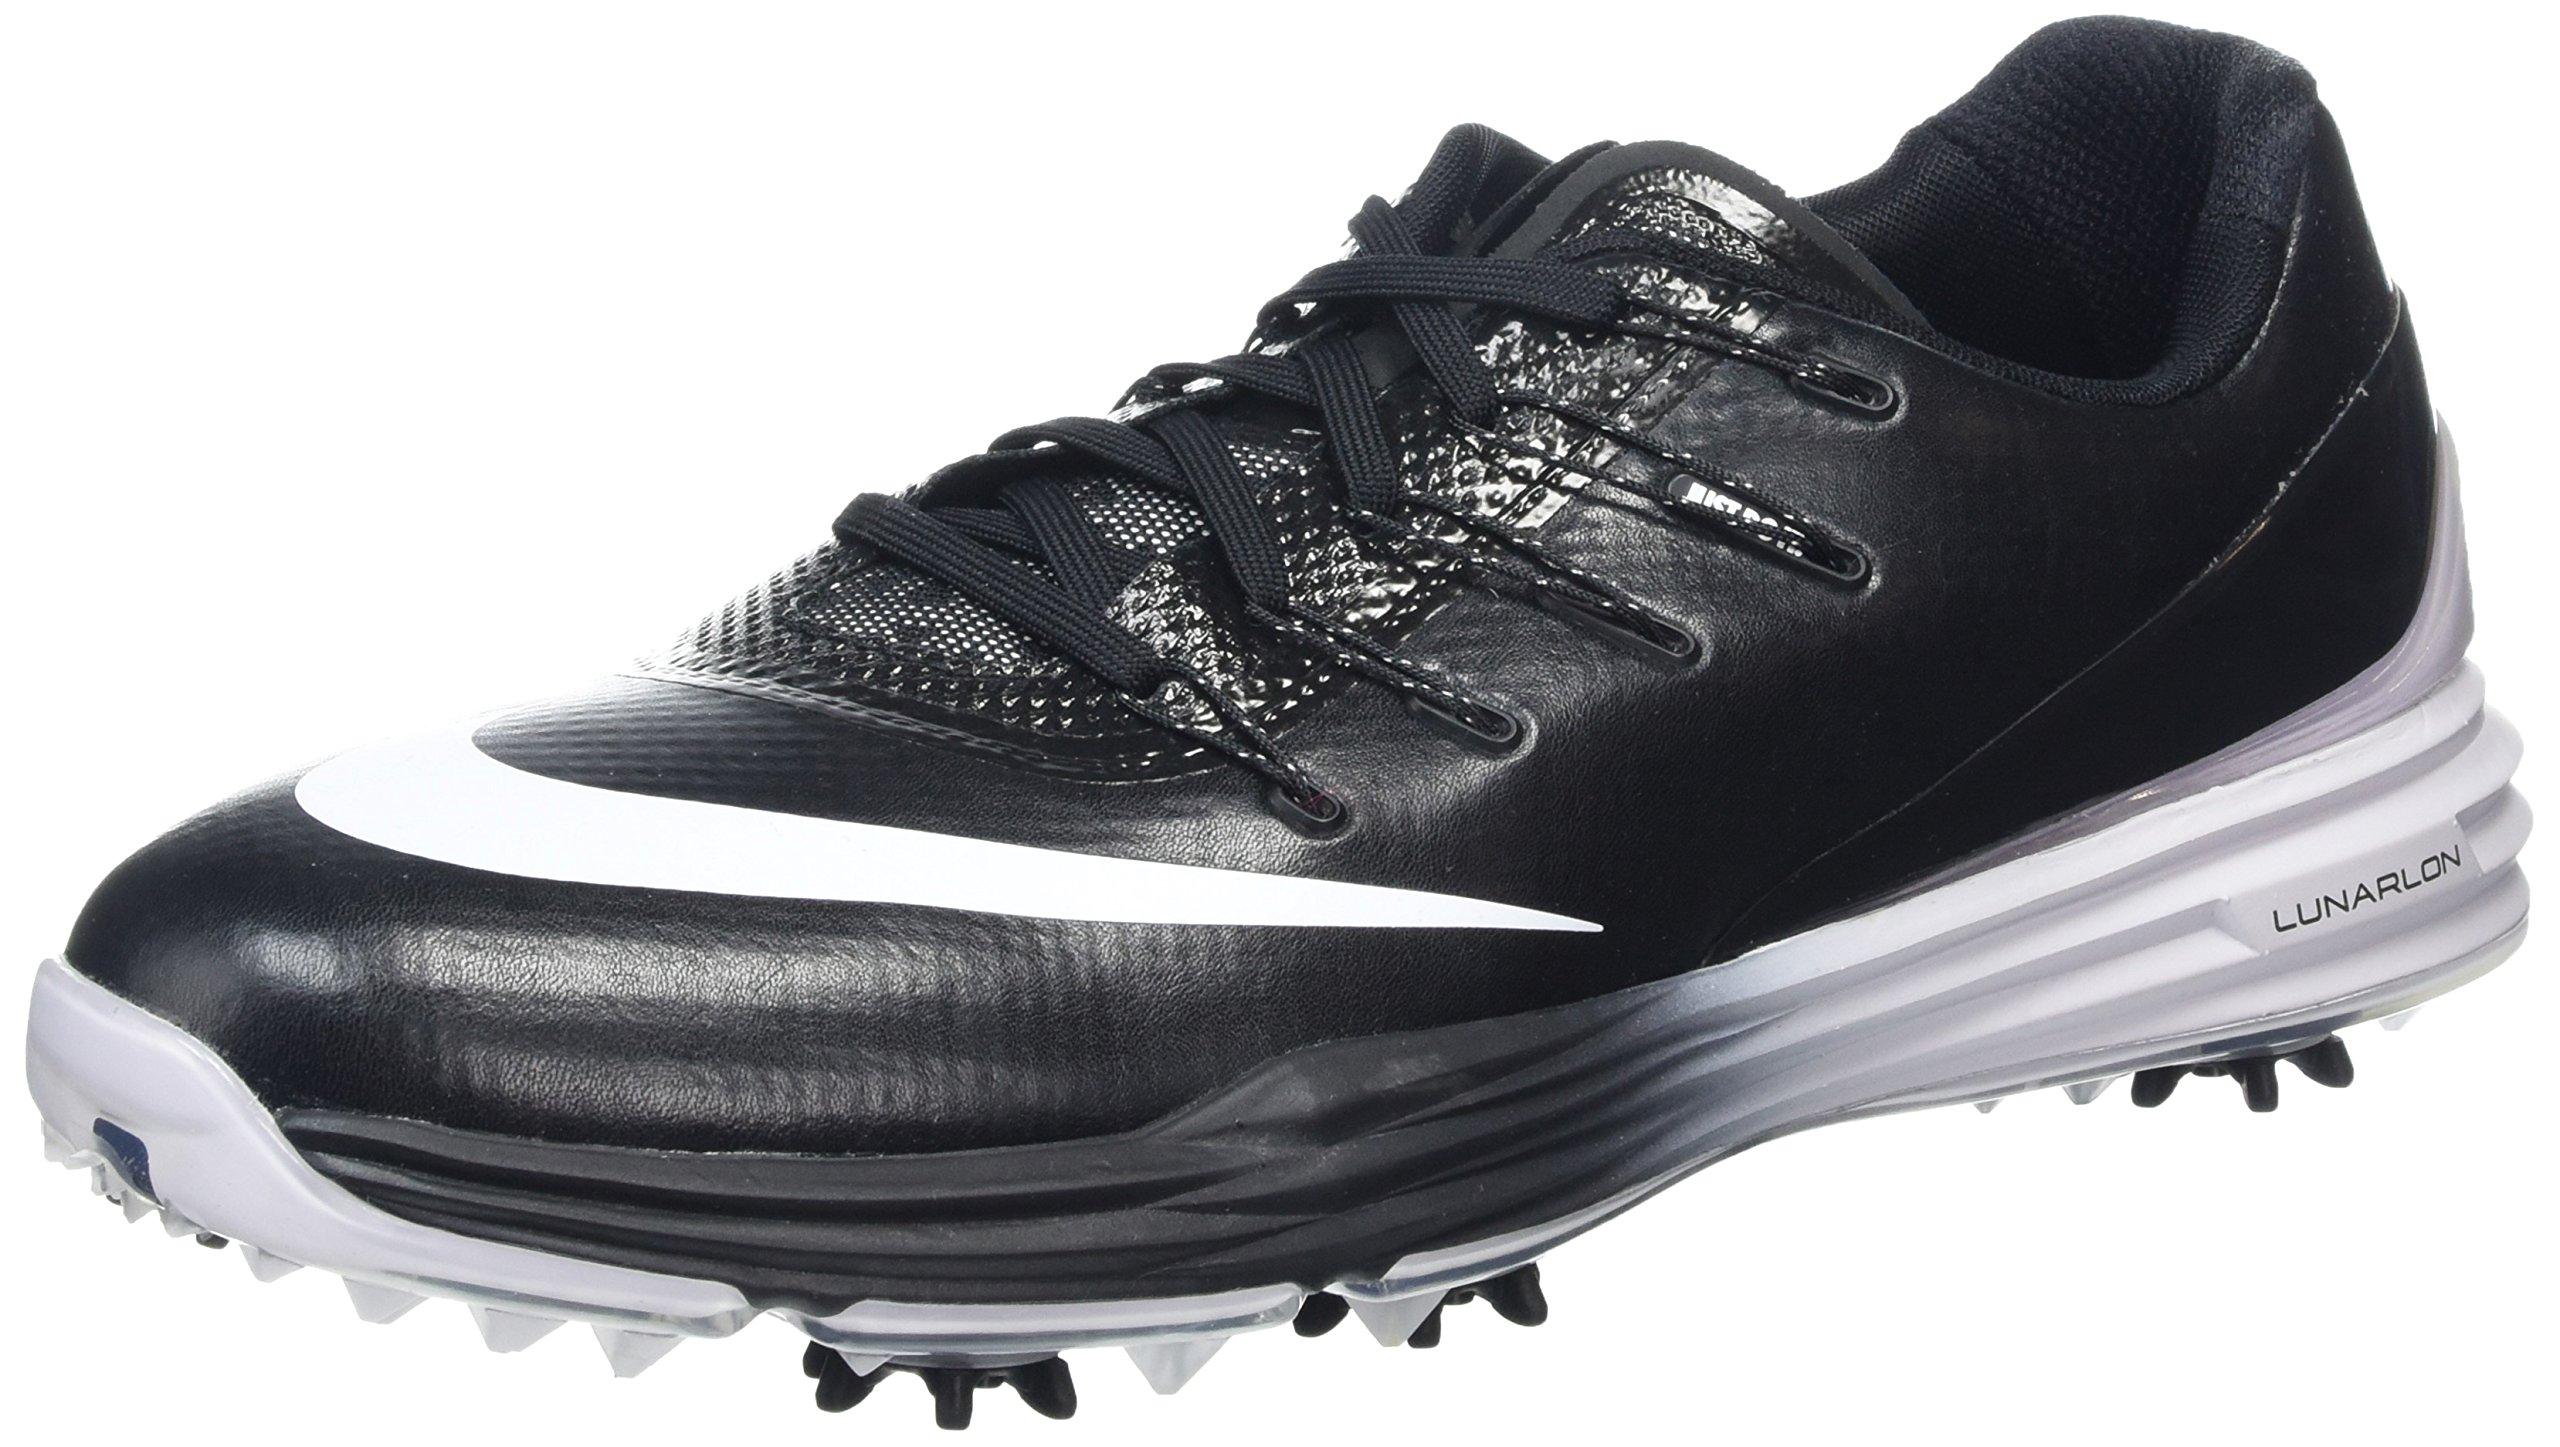 NIKE Lunar Control 4 Men's Golf Shoe (Black/White) 10